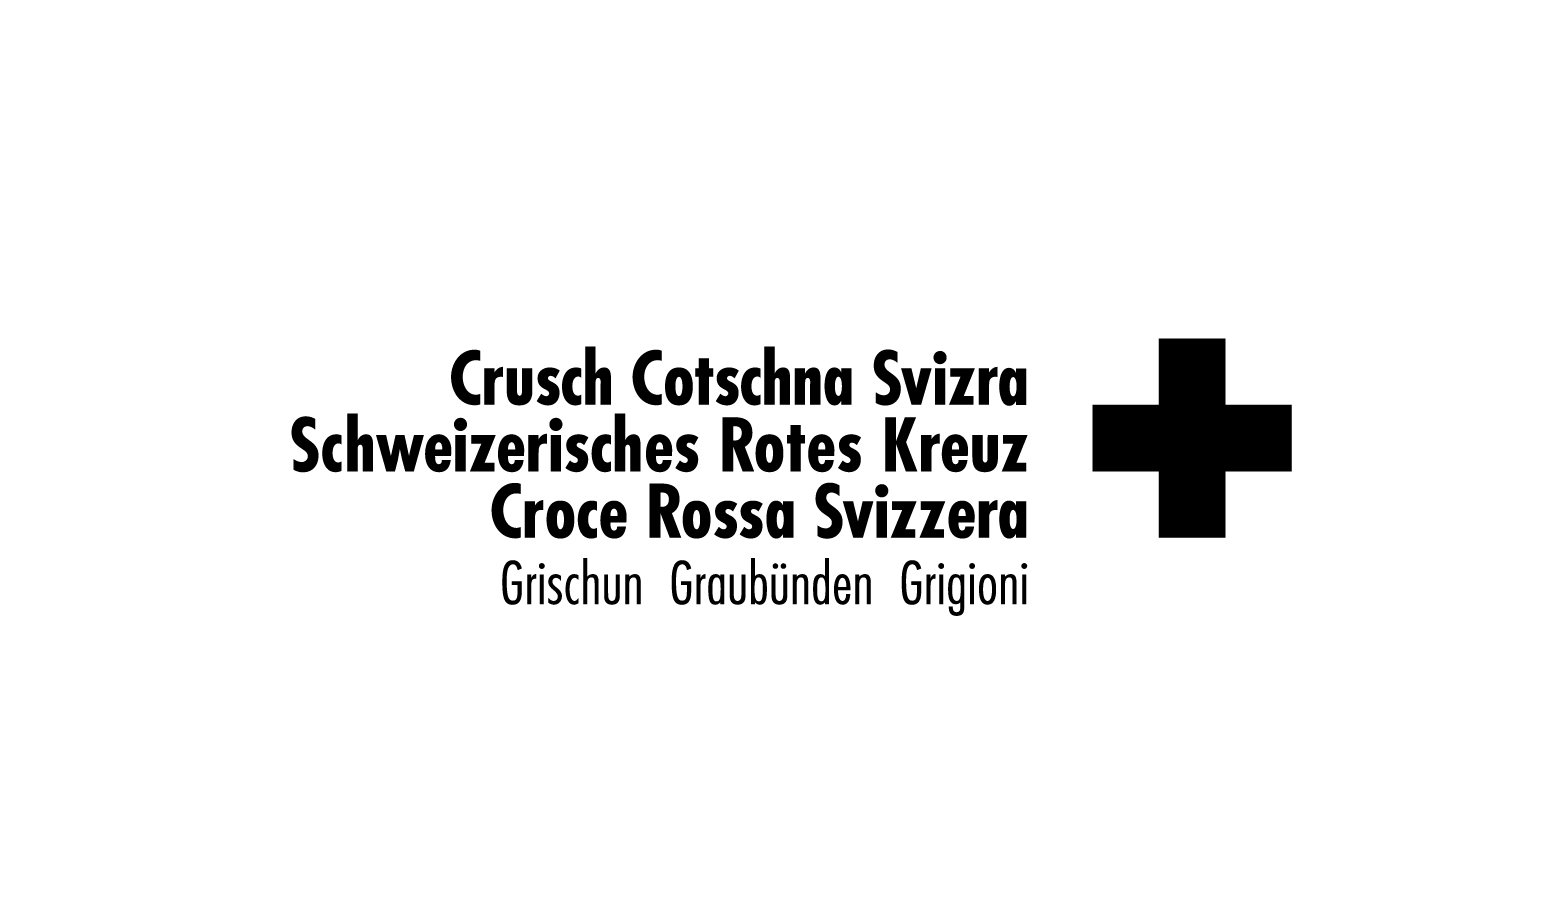 Rotes Kreuz Graubünden